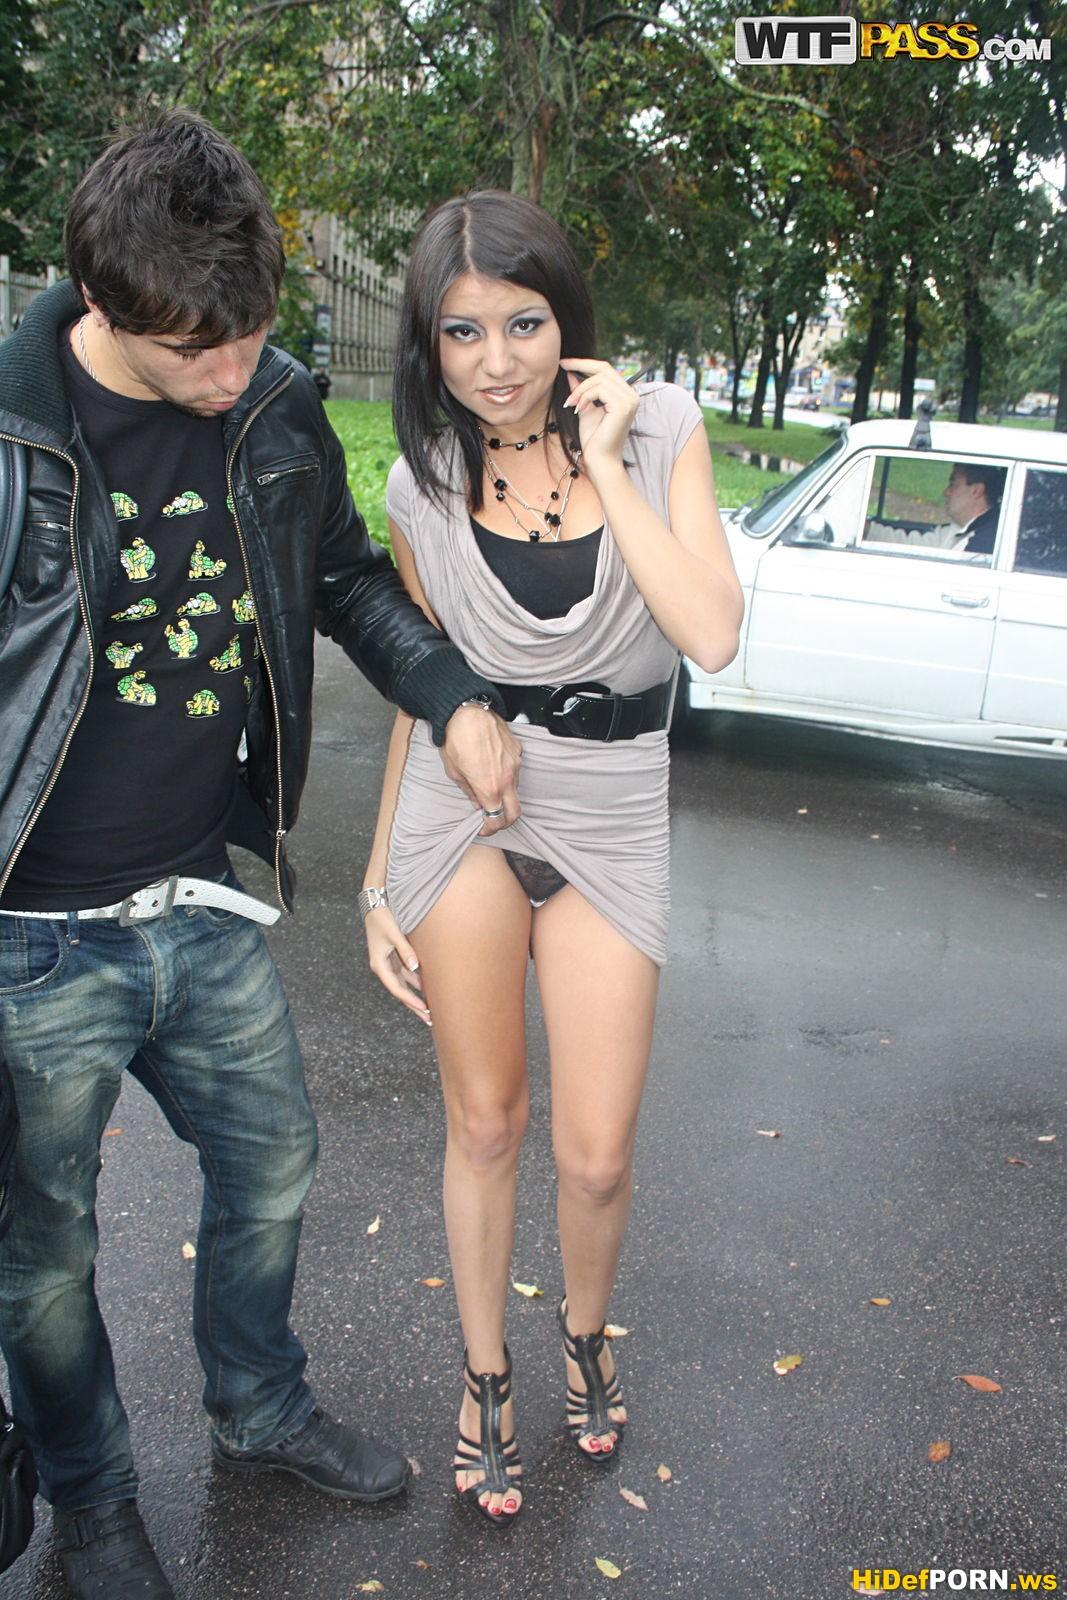 Снял на улице за деньги девушку 5 фотография